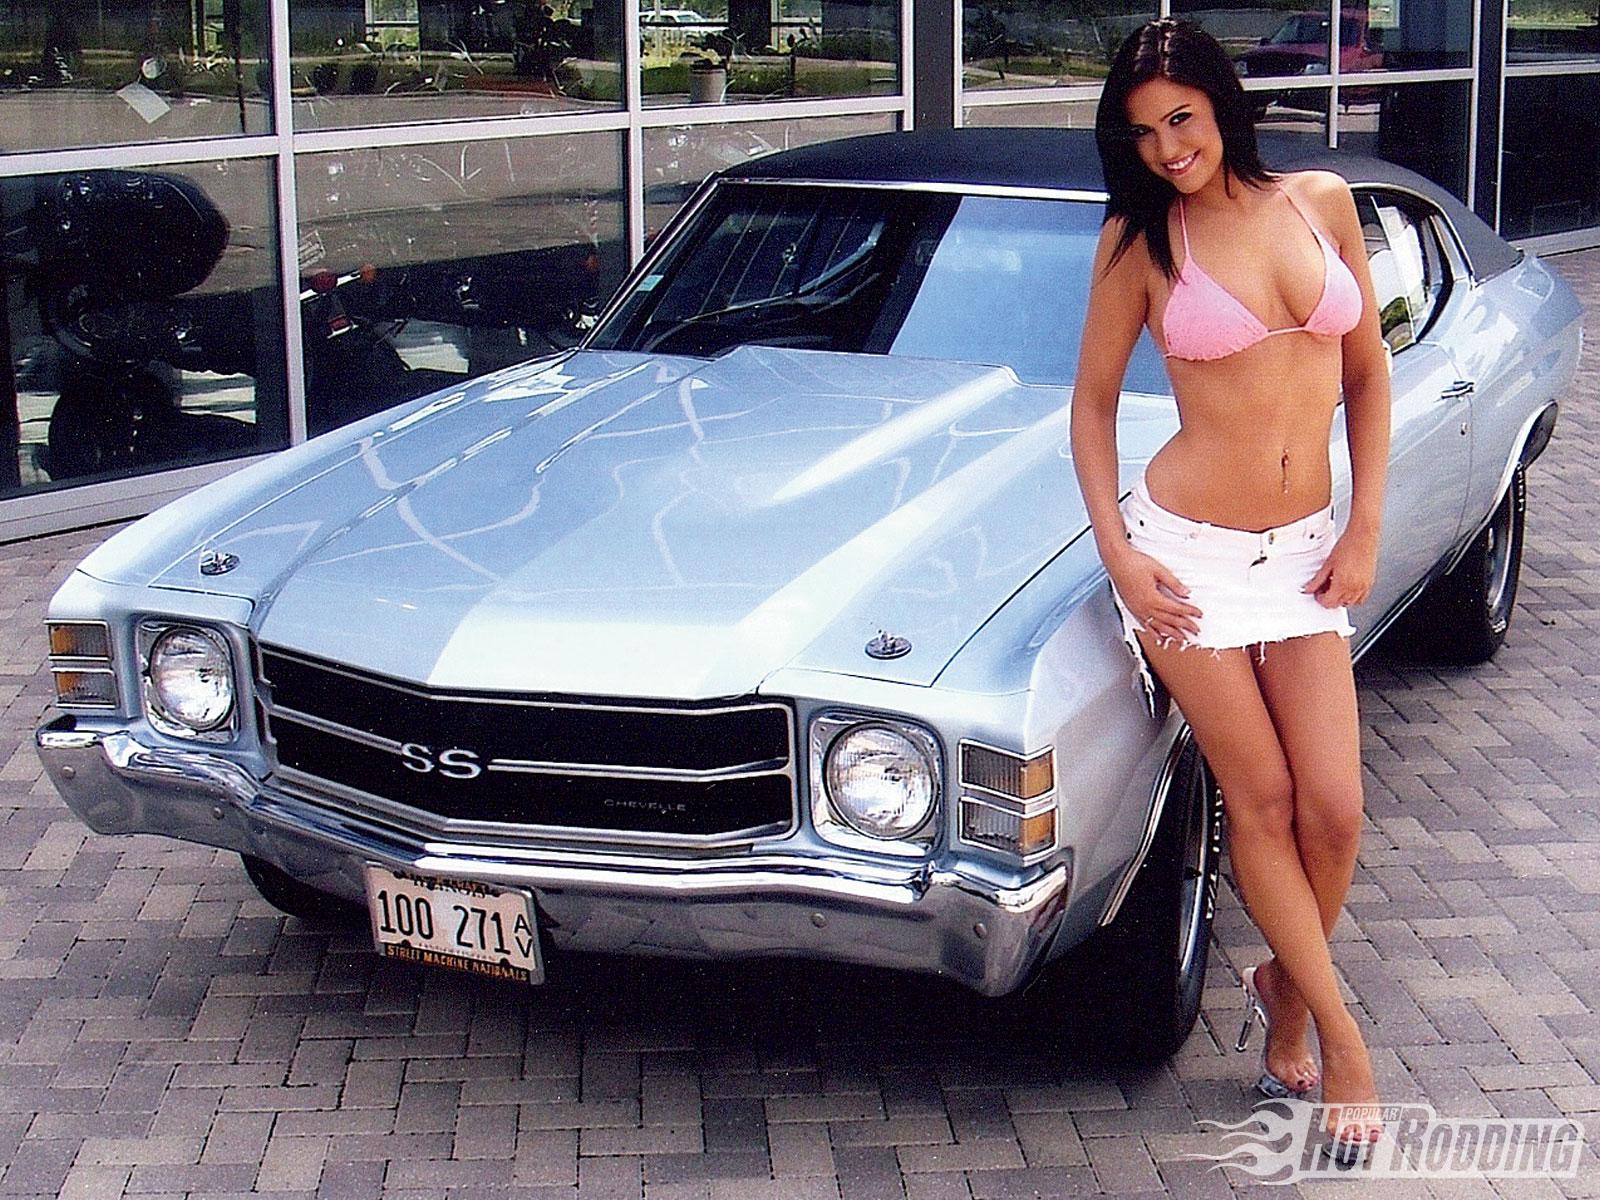 Lesbian Muscle Car 29